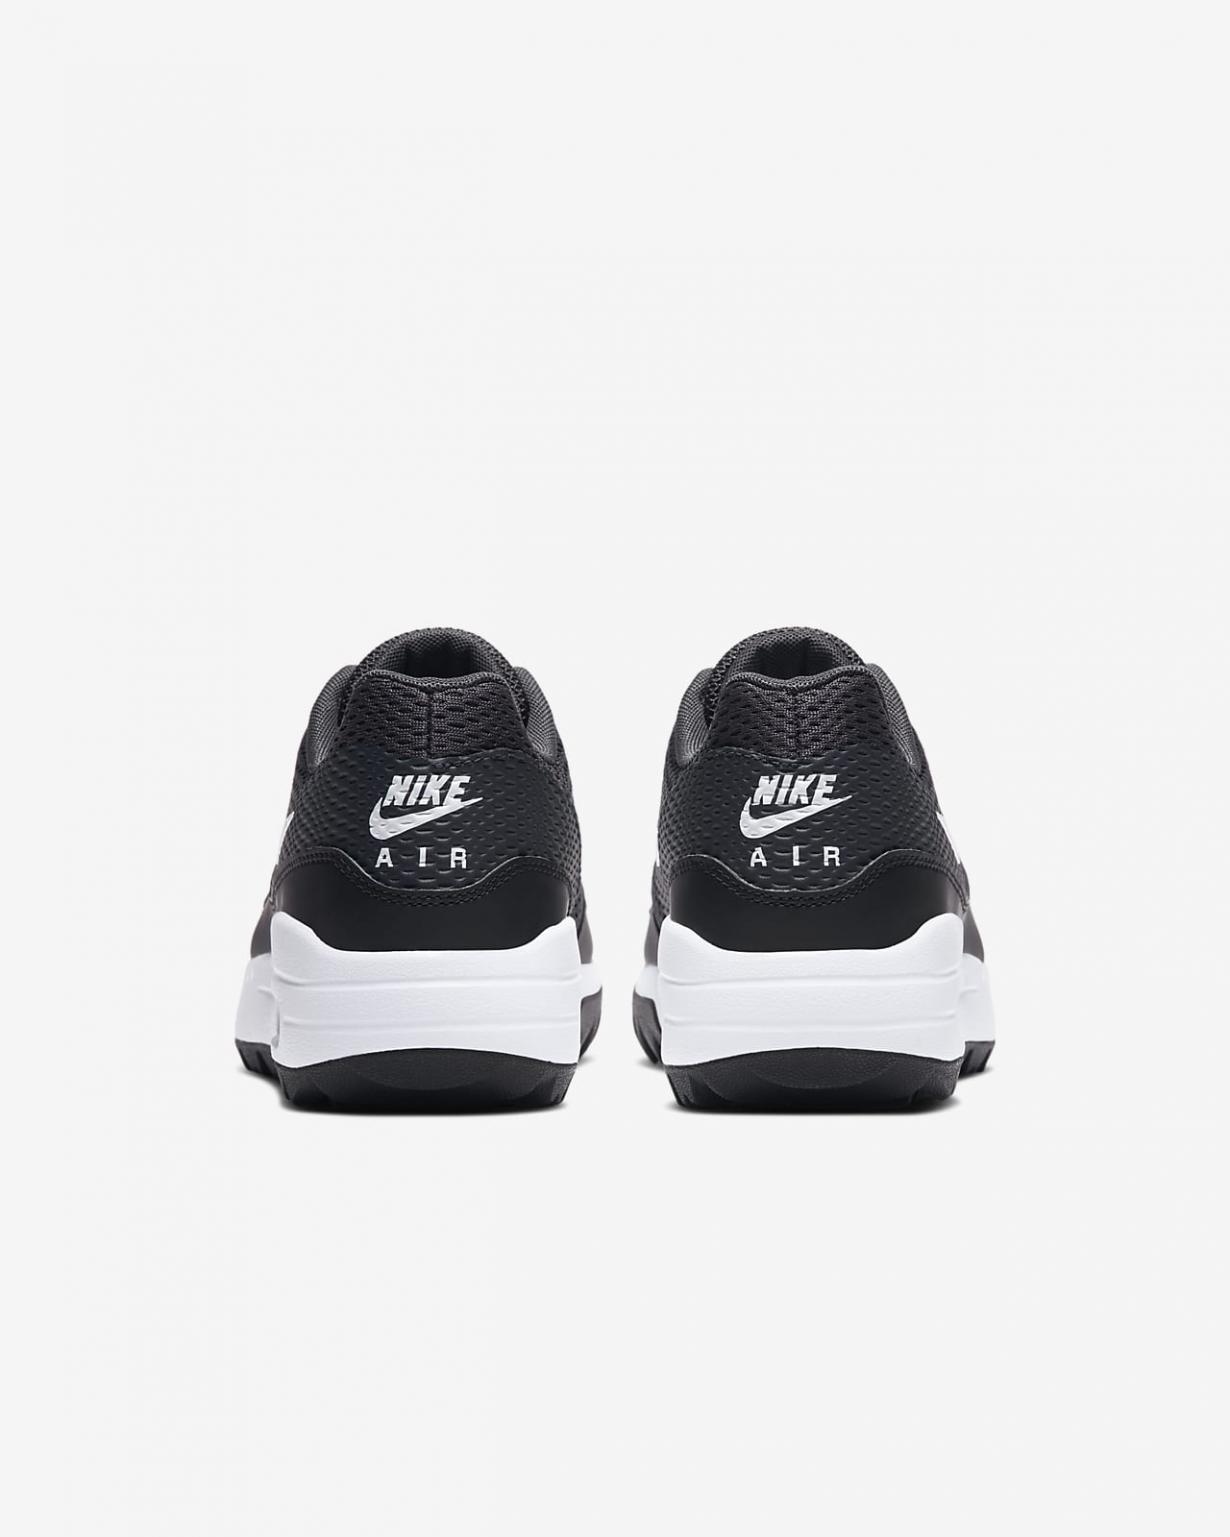 Golf Femme   Air Max 1 G Noir/Anthracite/Blanc/Blanc   Nike < Gooddaytricities